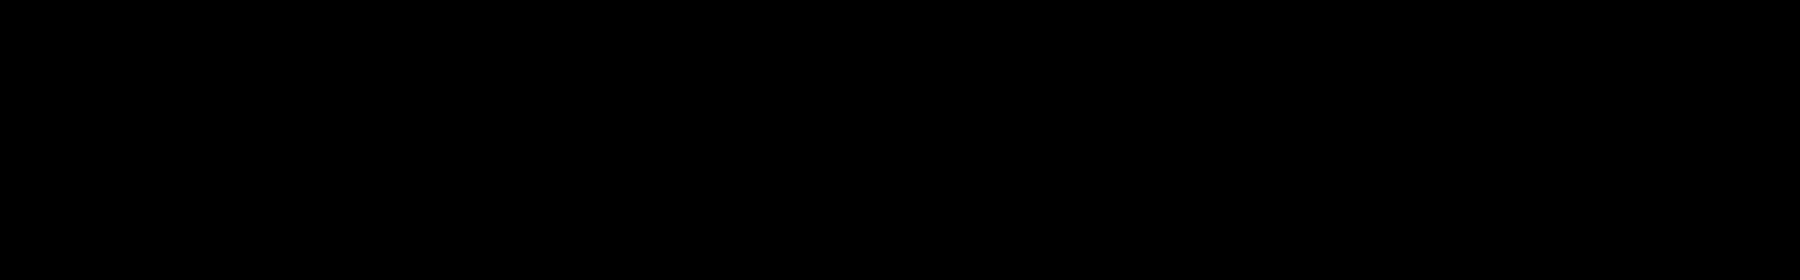 Retro Hooks audio waveform